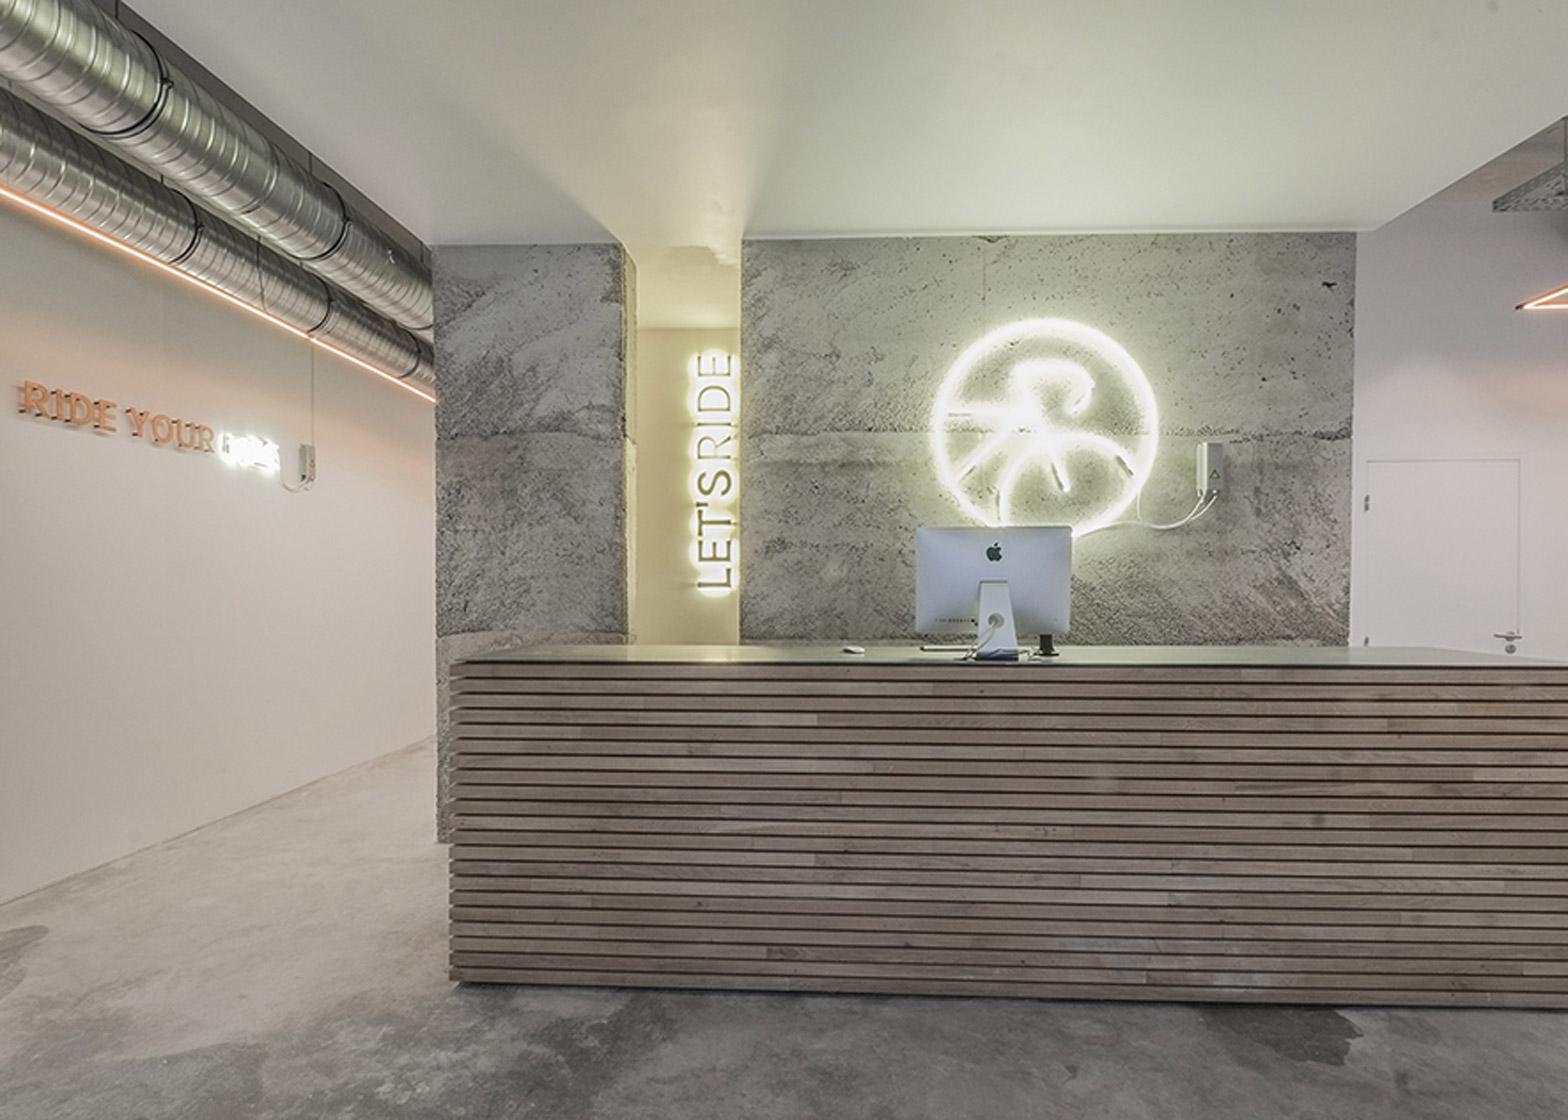 Architecture-paris-sport-club-design-studia-interiors-osnovadesign-osnova-poltava-11